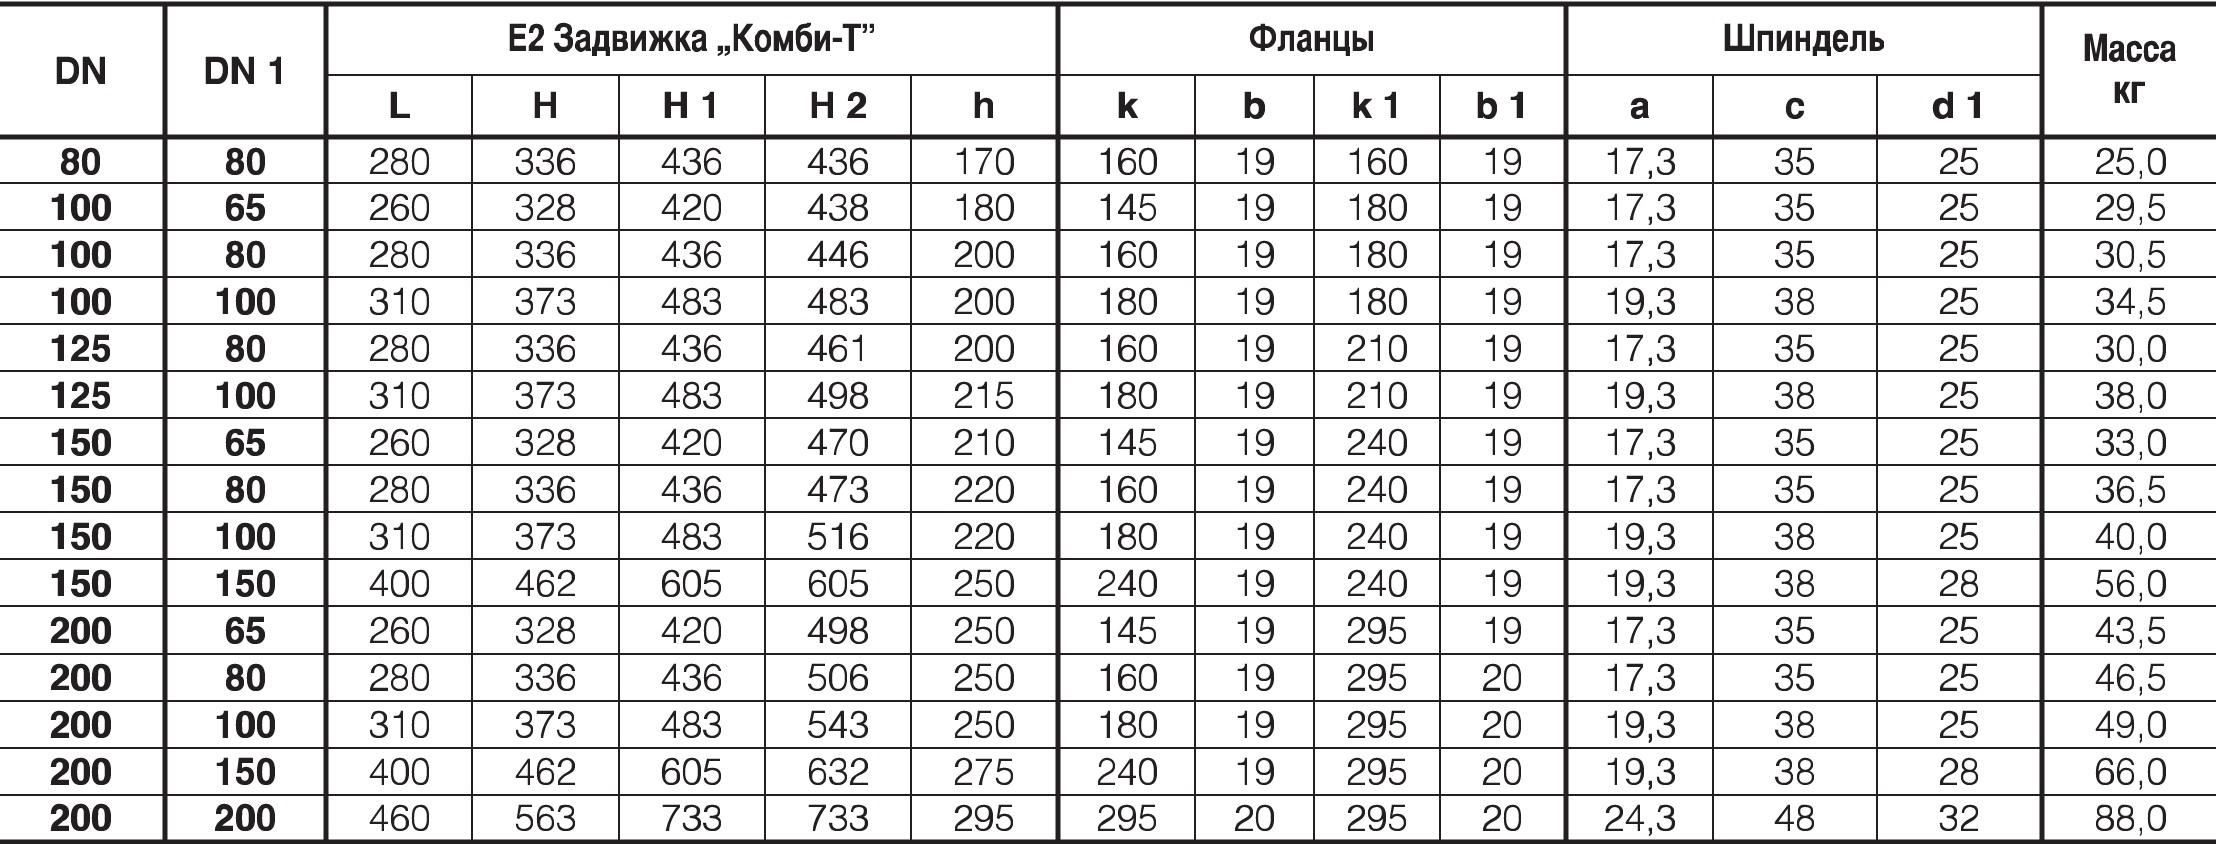 "Таблица характеристик для Задвижка Hawle 4340E2 типа ""Комби-Т"" фланцевая"